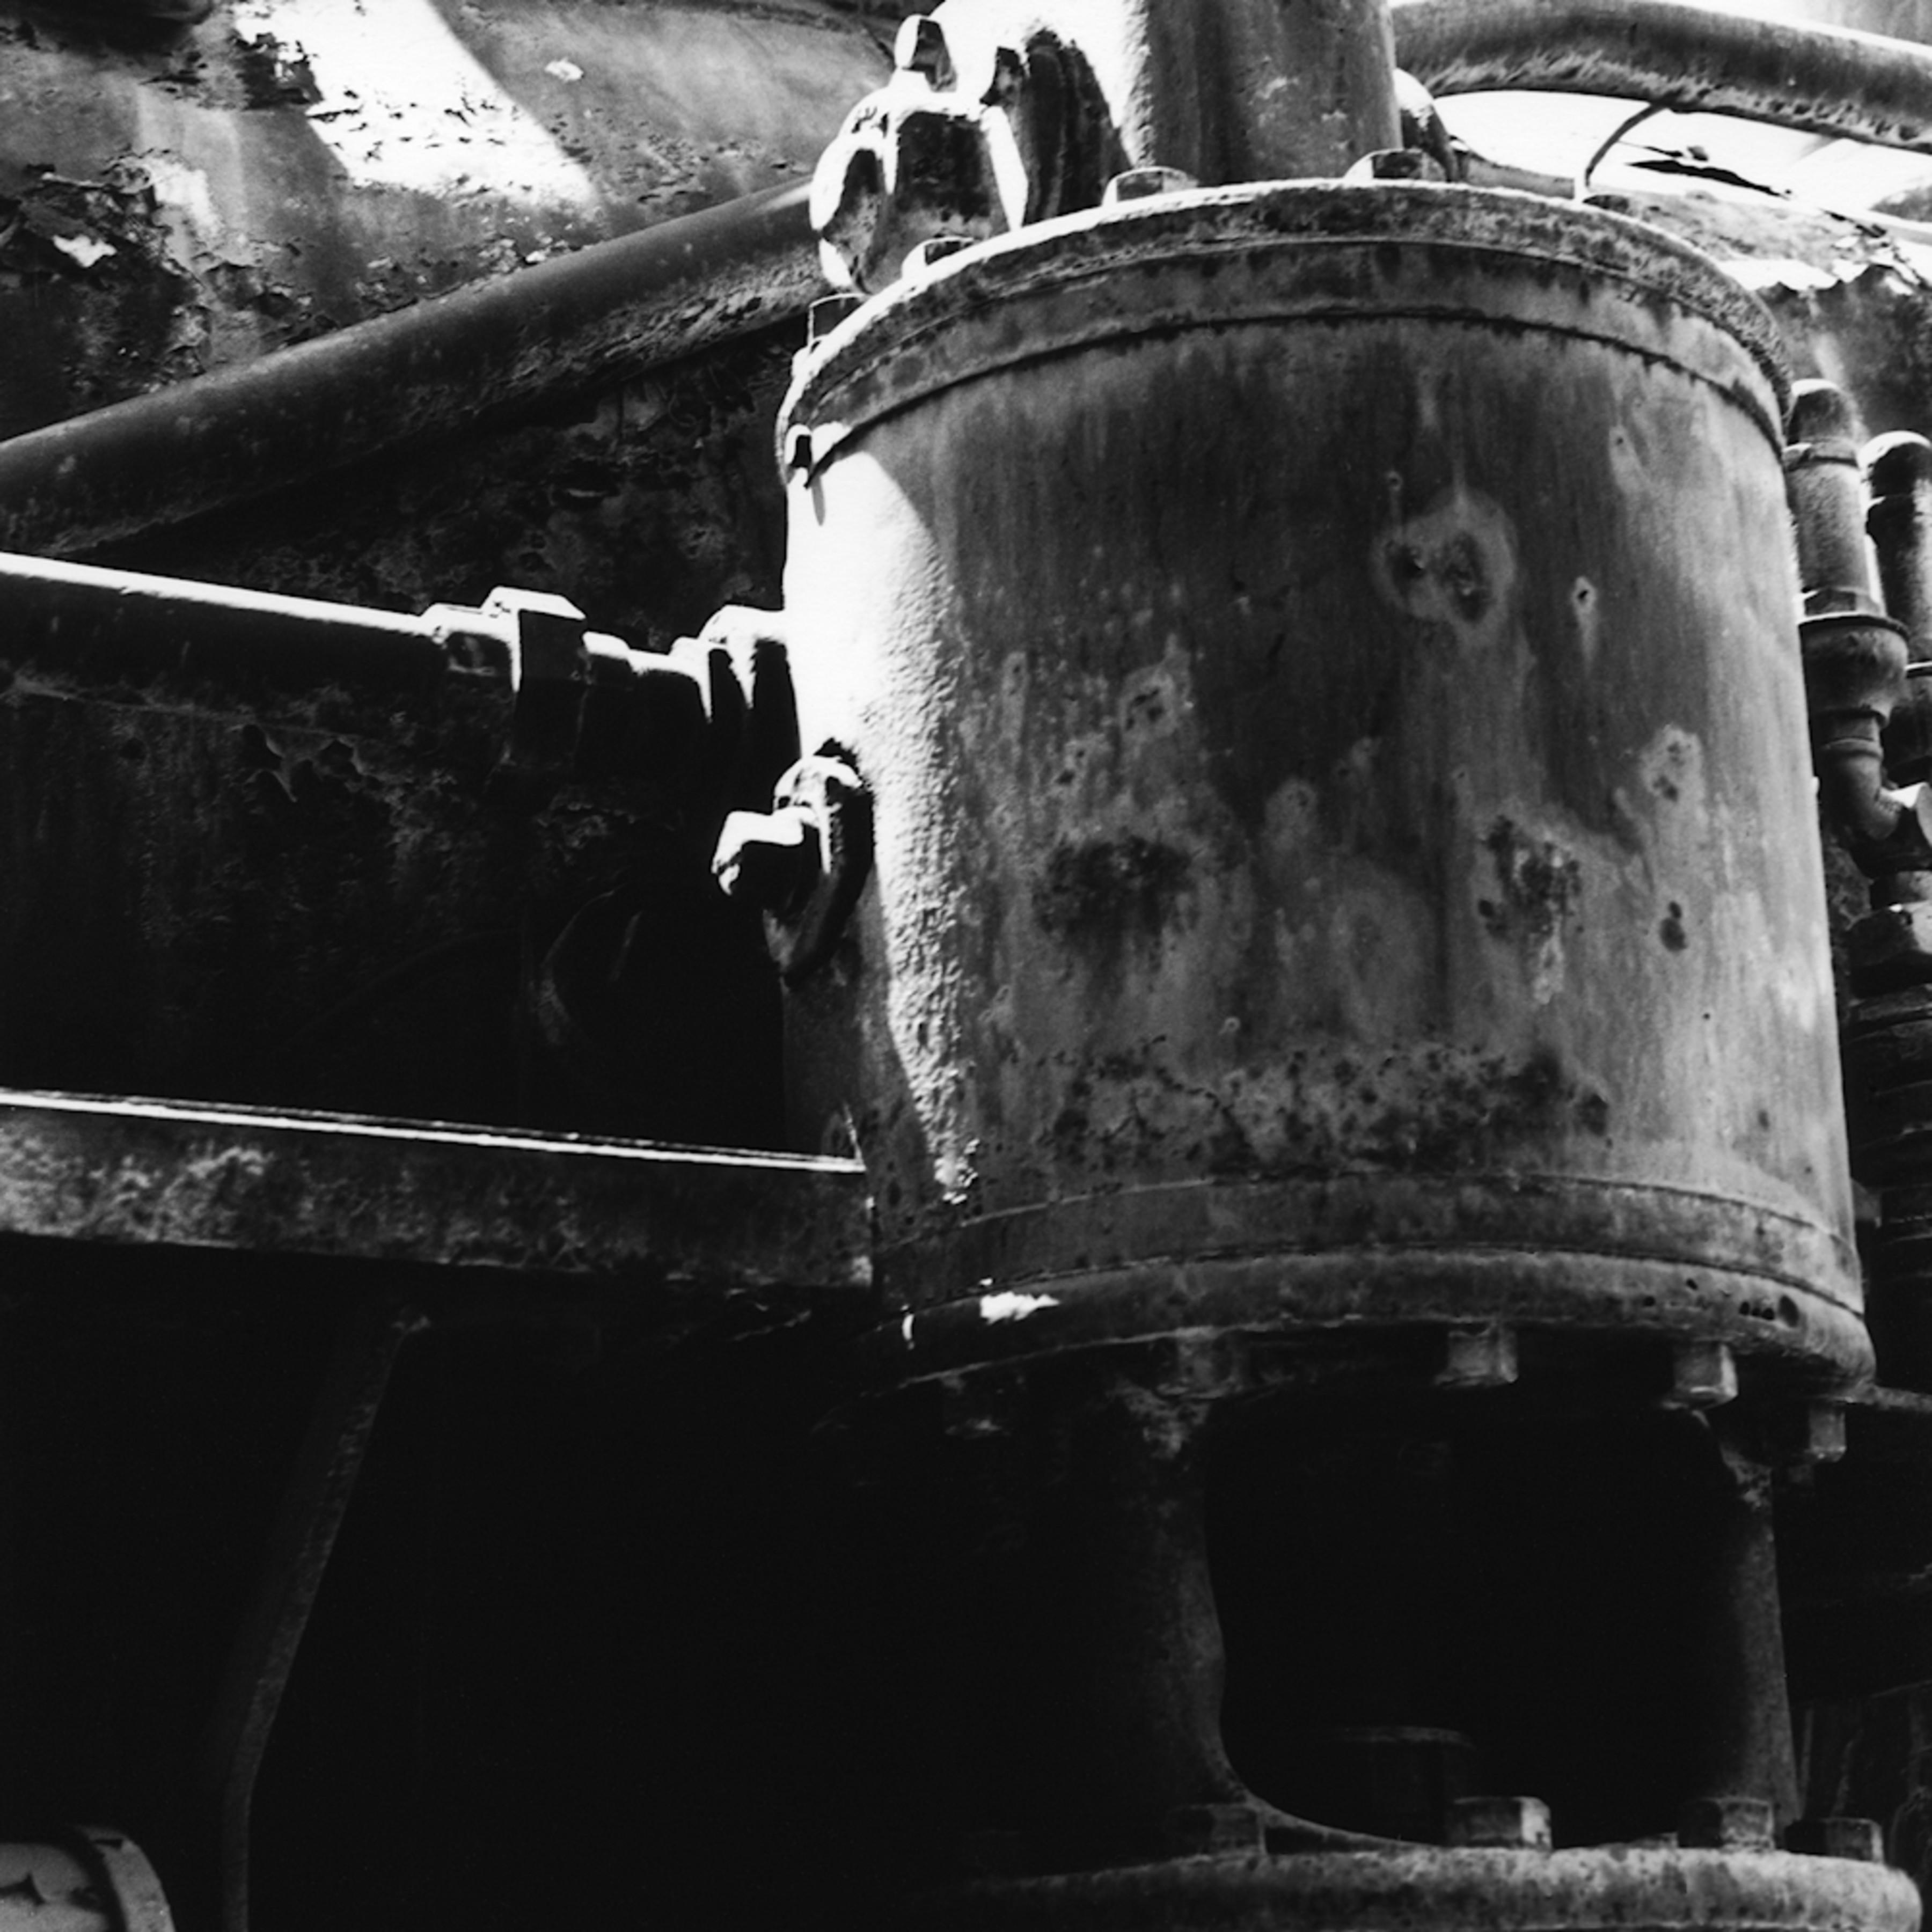 Untitled 4 furnace creek ca 2010 luis38